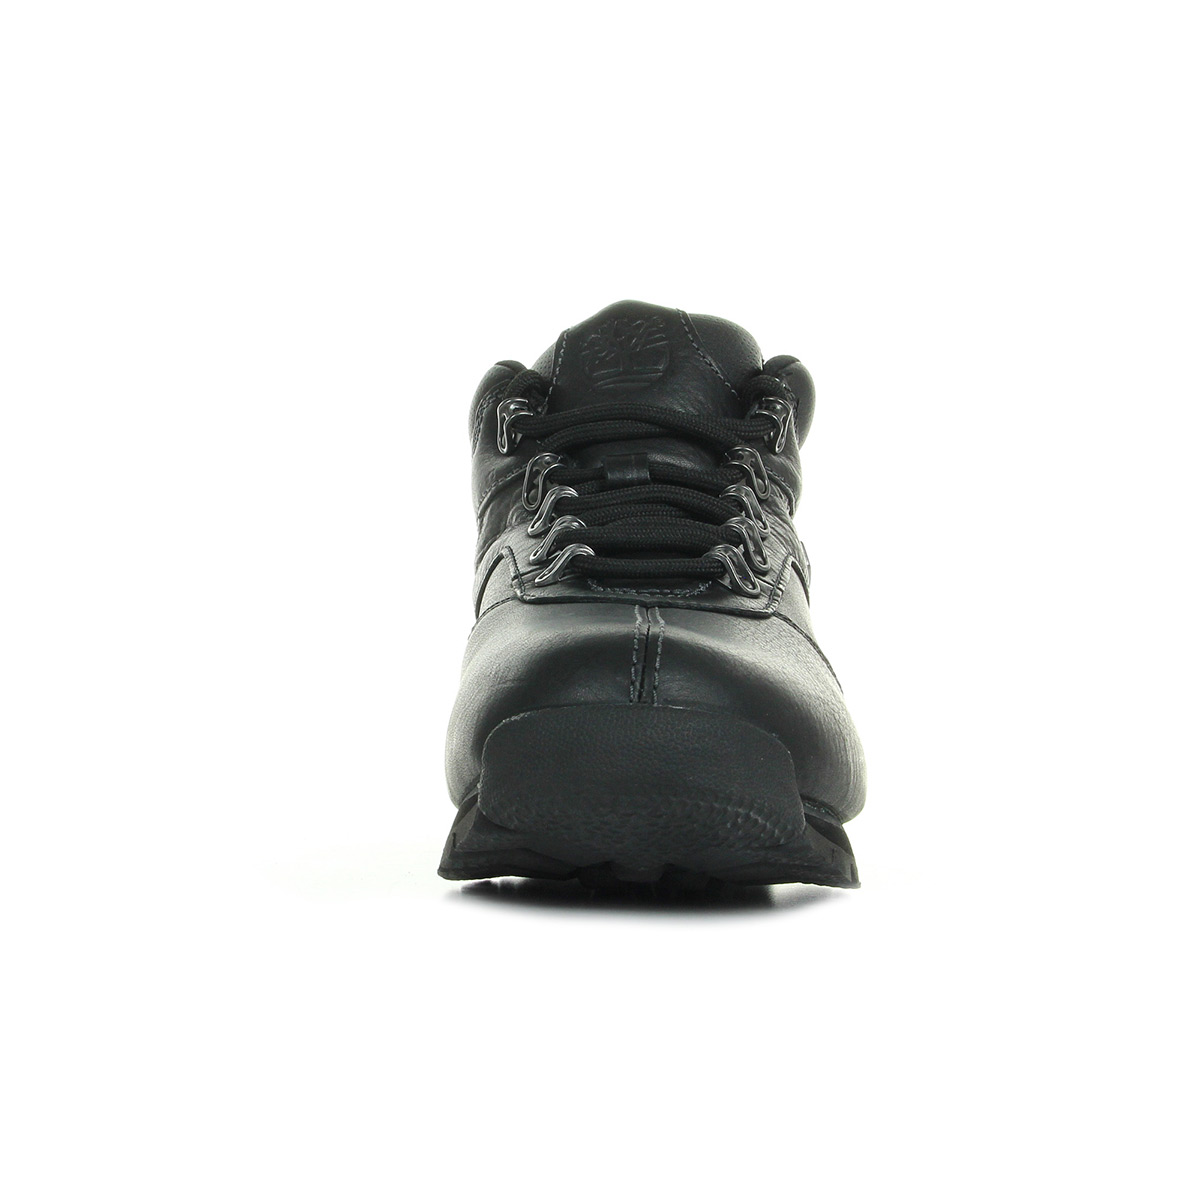 Timberland Splitrock 2 Black CA11XF, Boots homme